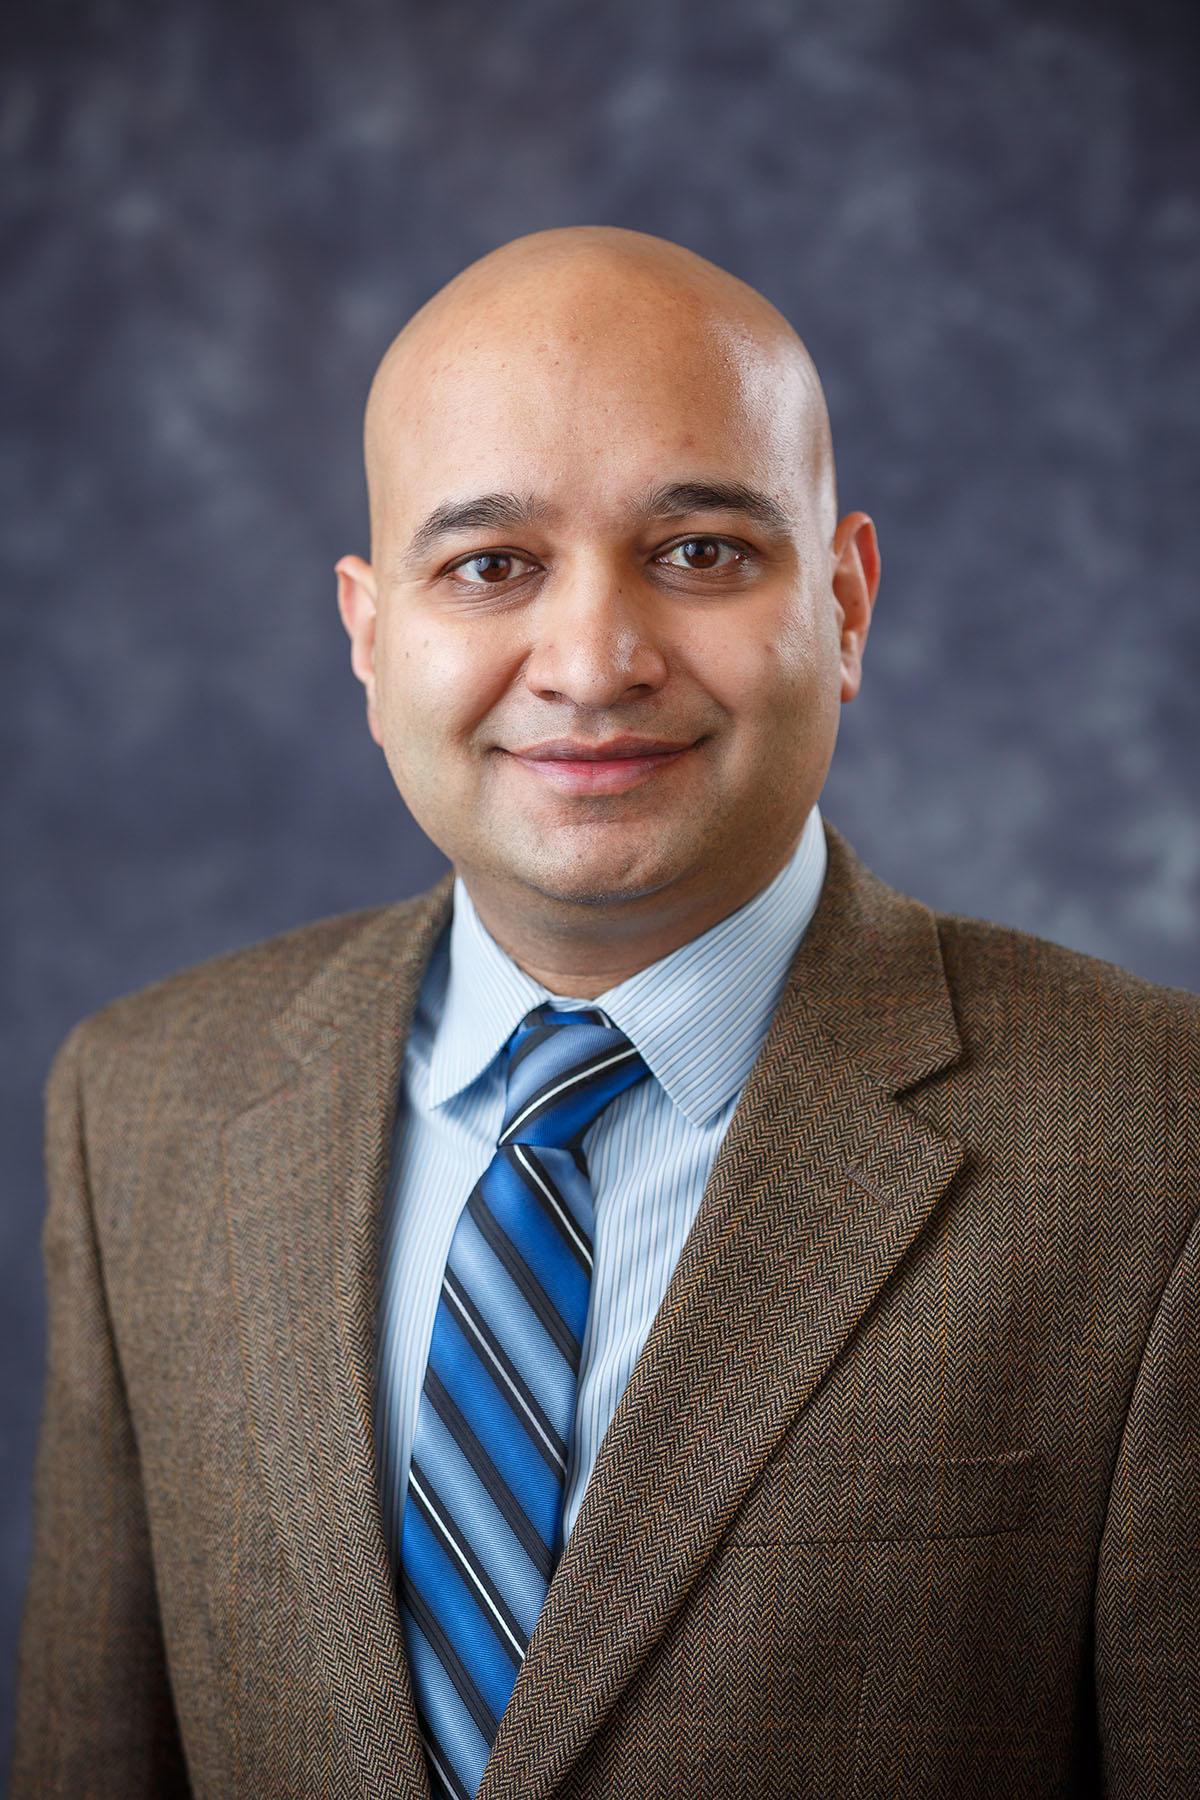 Syed M. Rizvi - Beacon Medical Group Kidney & Hypertension